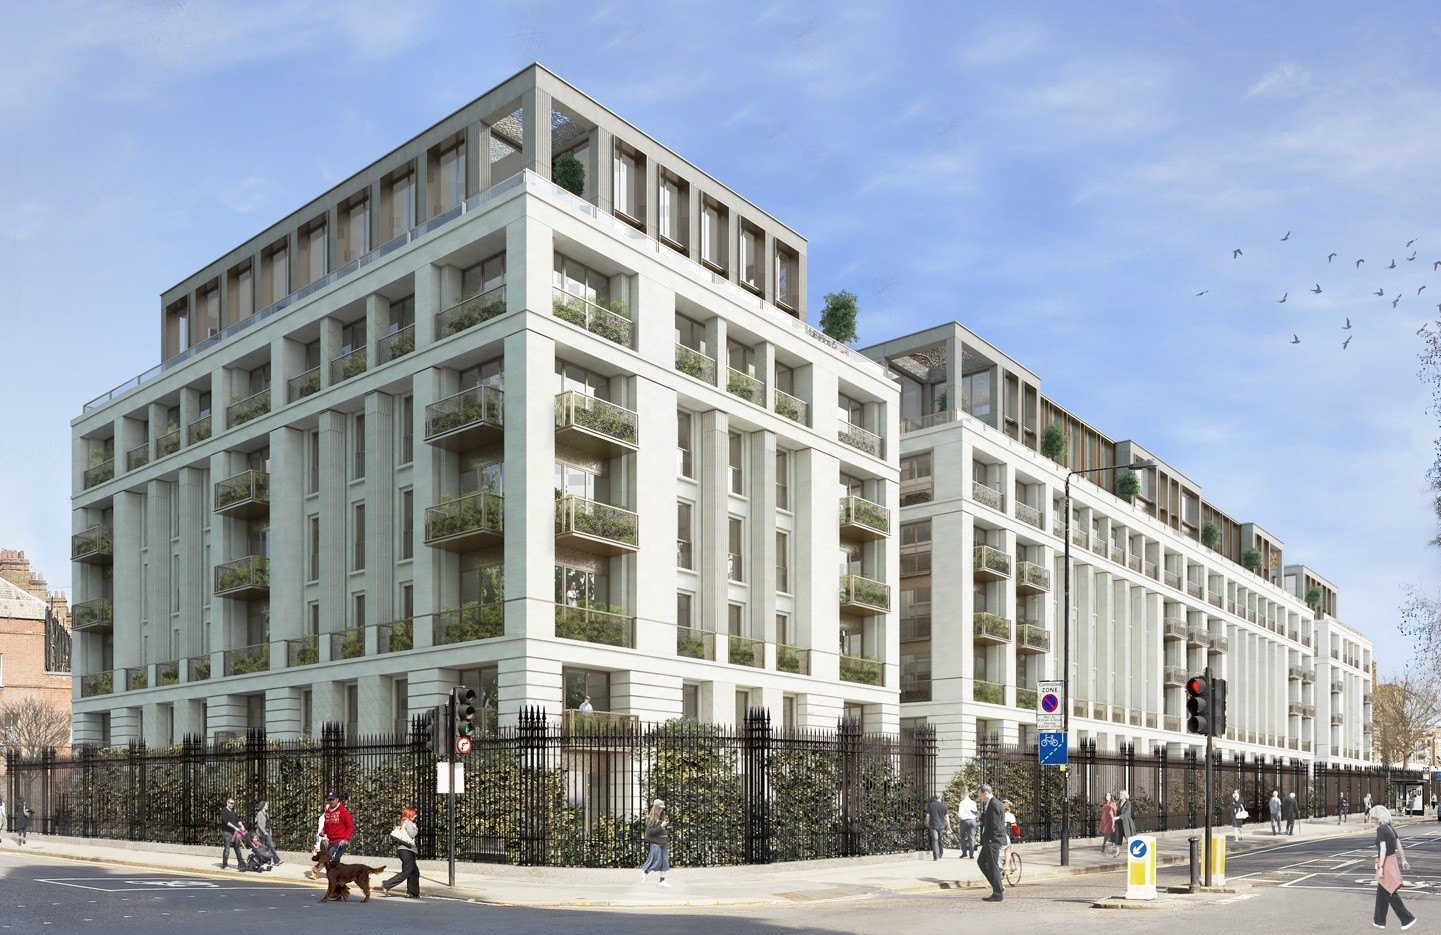 Planning Finally Granted Chelsea Barracks